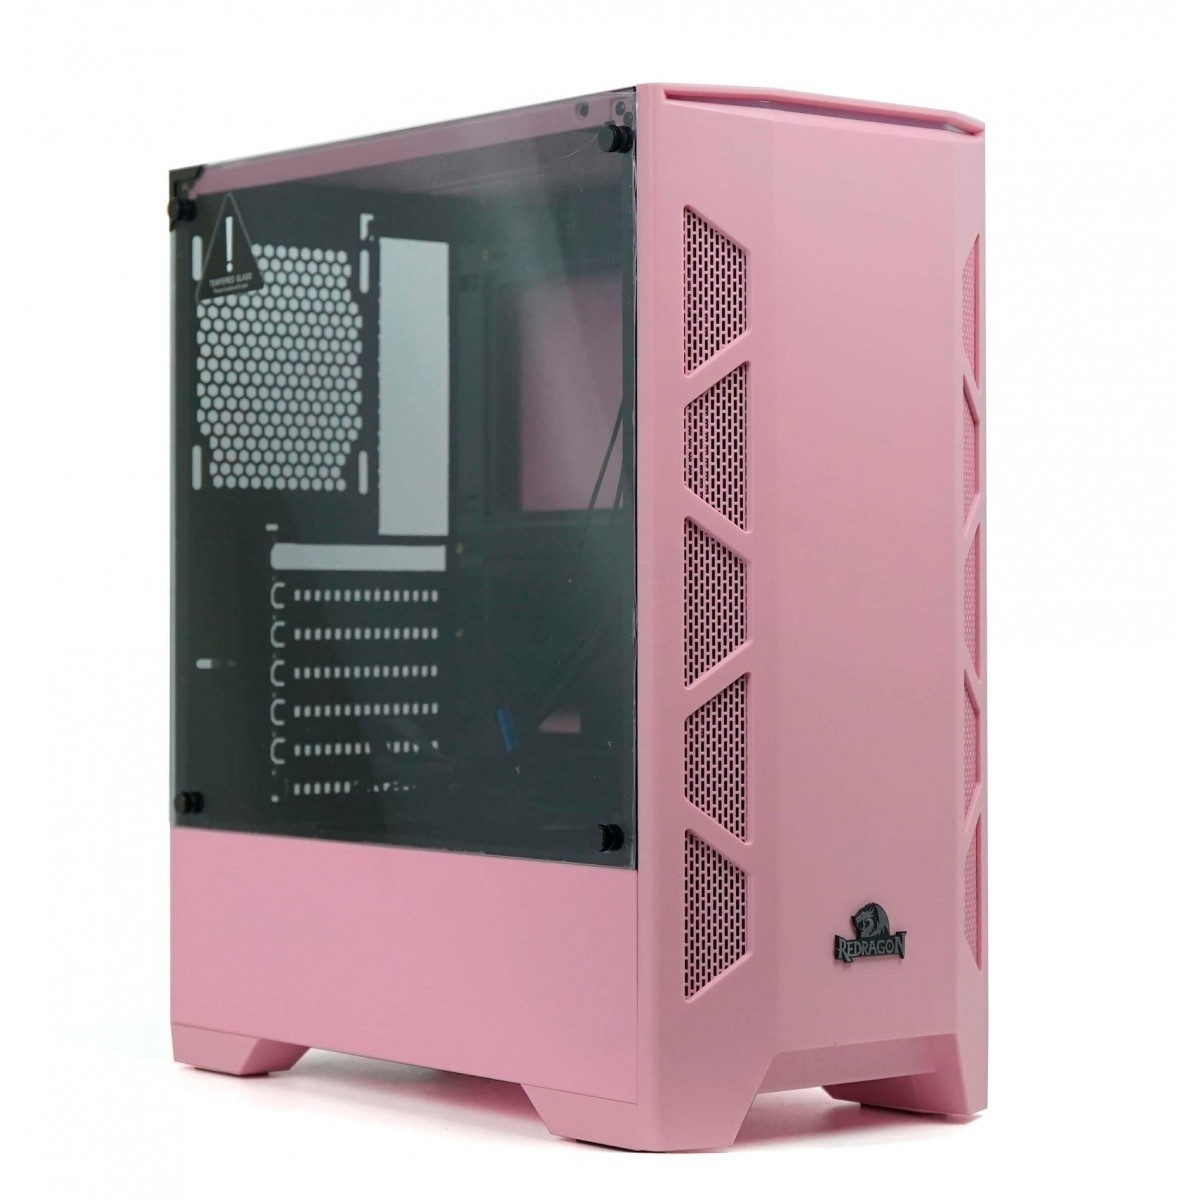 Computador Gamer, RYZEN 3 3200G 3.6Ghz , VIdeo Vega 8, 8GB DDR4, SSD 240GB